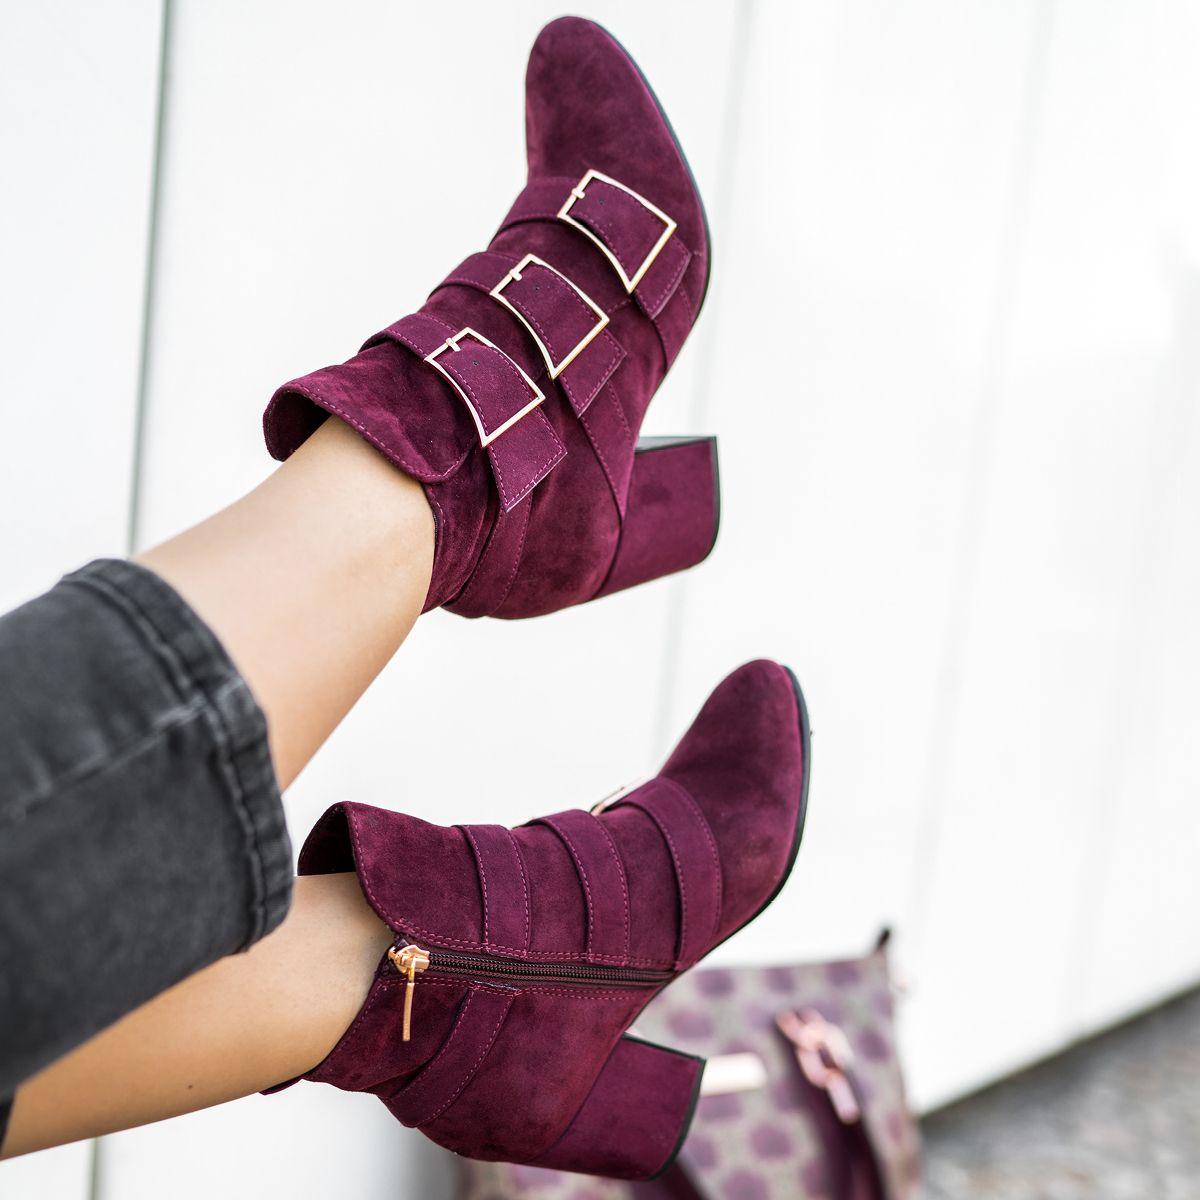 Helia Stiefelette | Fashion | Fashion, Designer shoes i Shoes